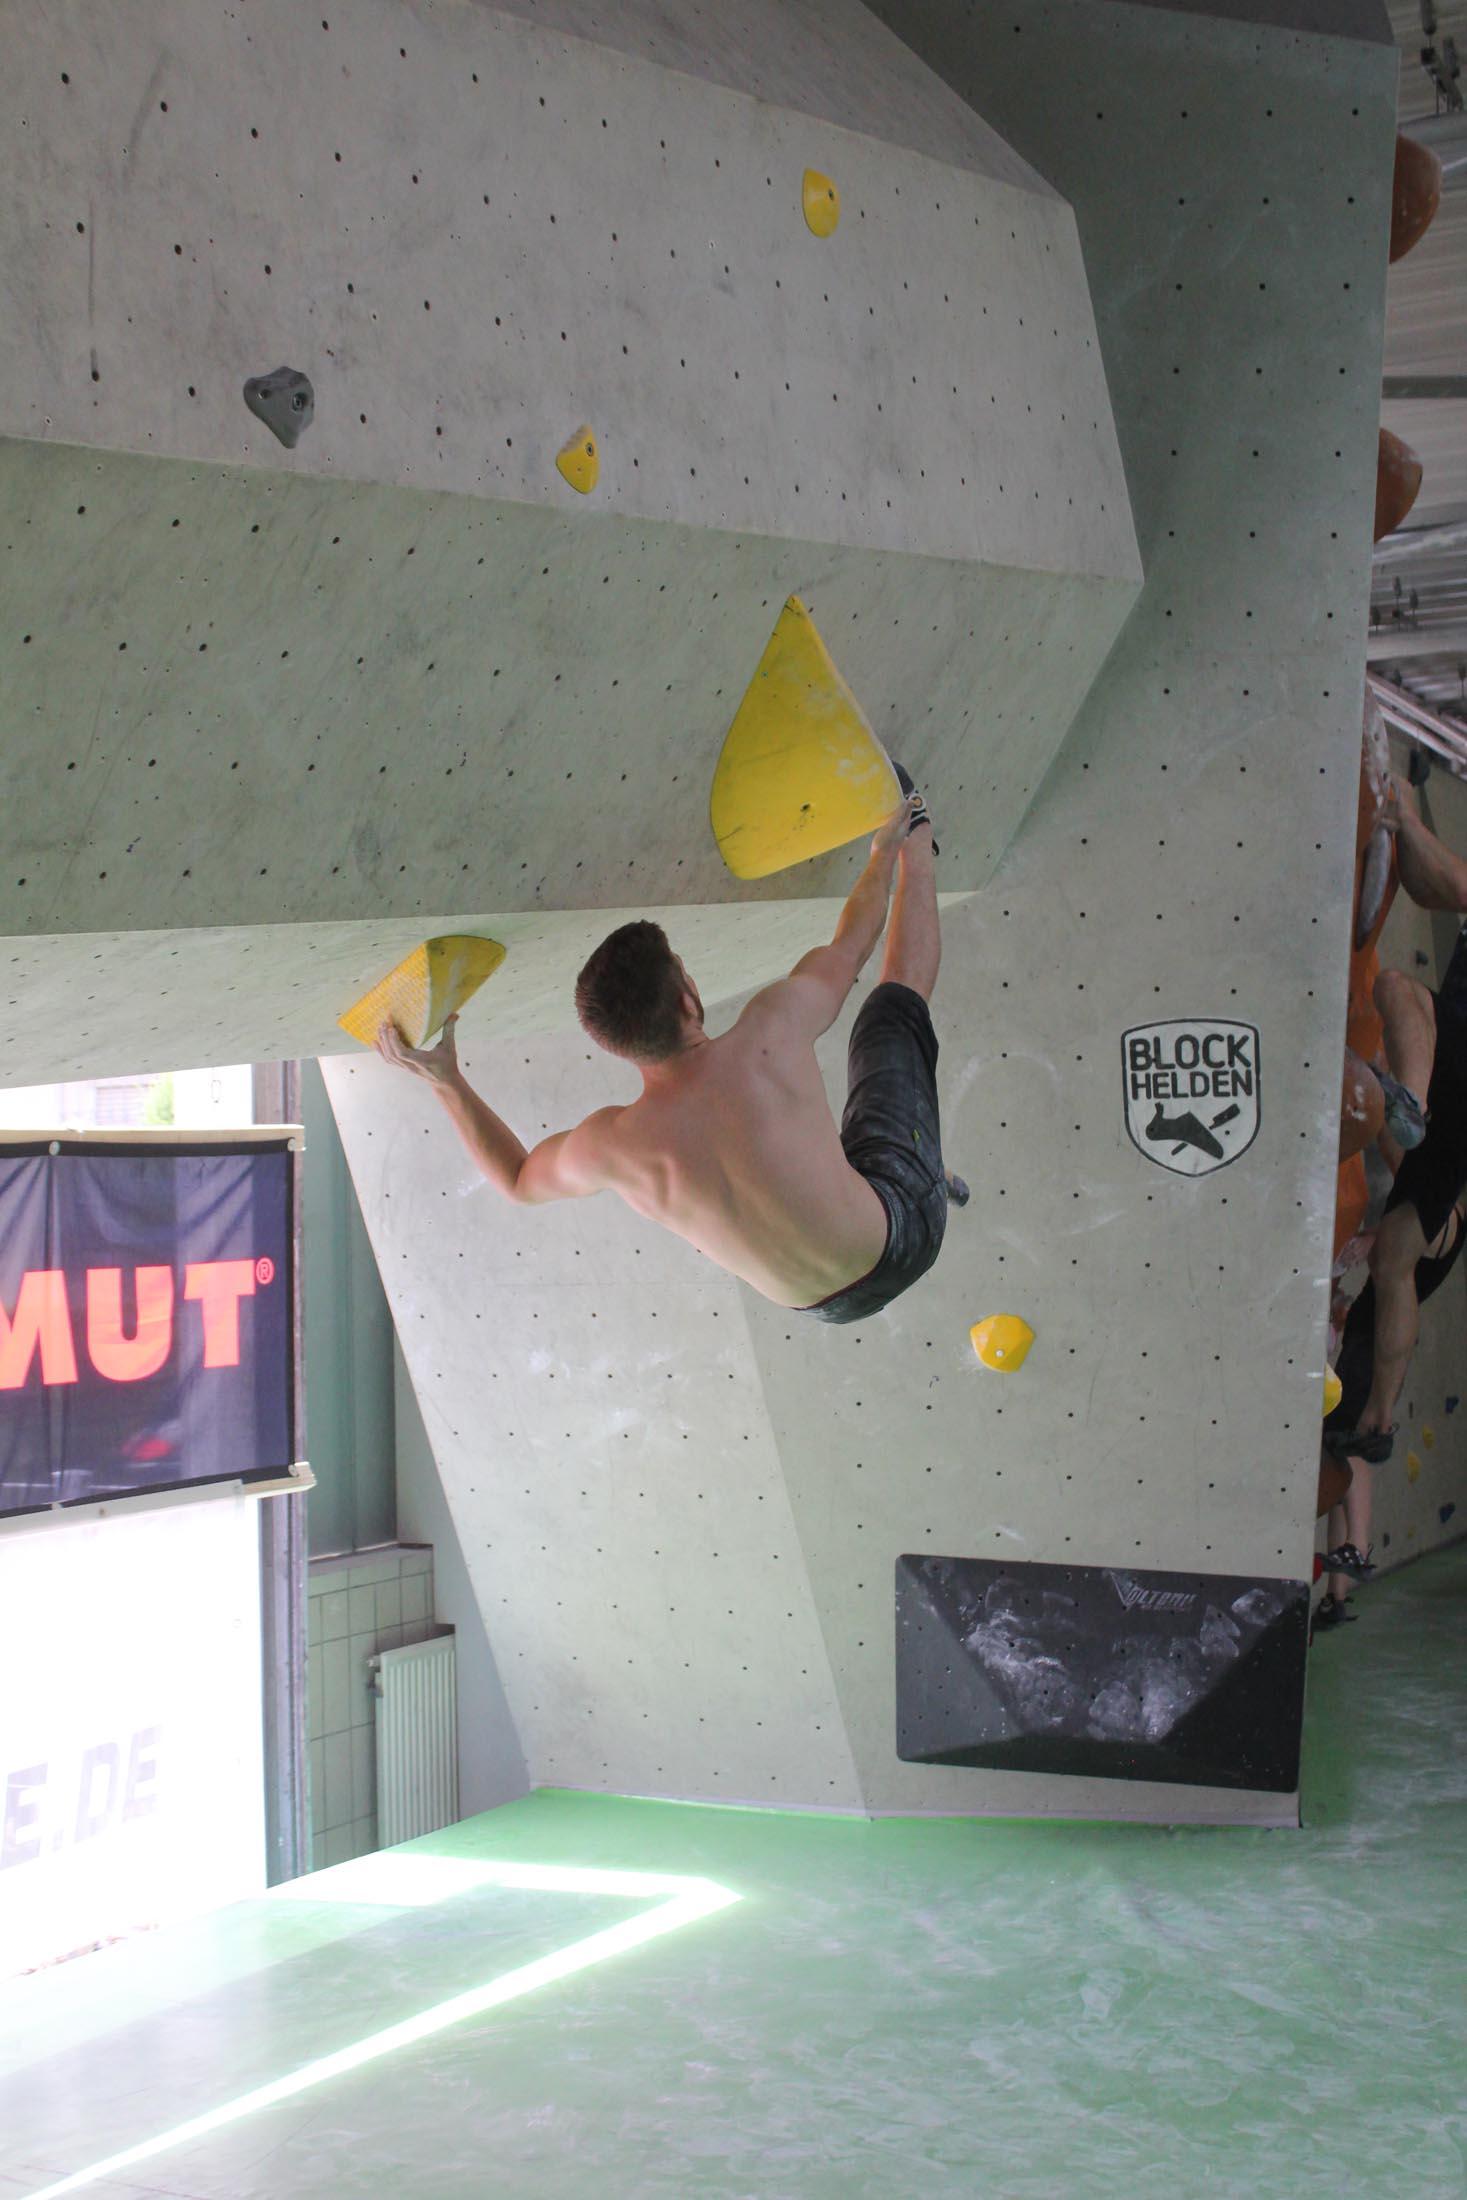 Quali, internationaler bouldercup Frankenjura 2016, BLOCKHELDEN Erlangen, Mammut, Bergfreunde.de, Boulderwettkampf07092016183